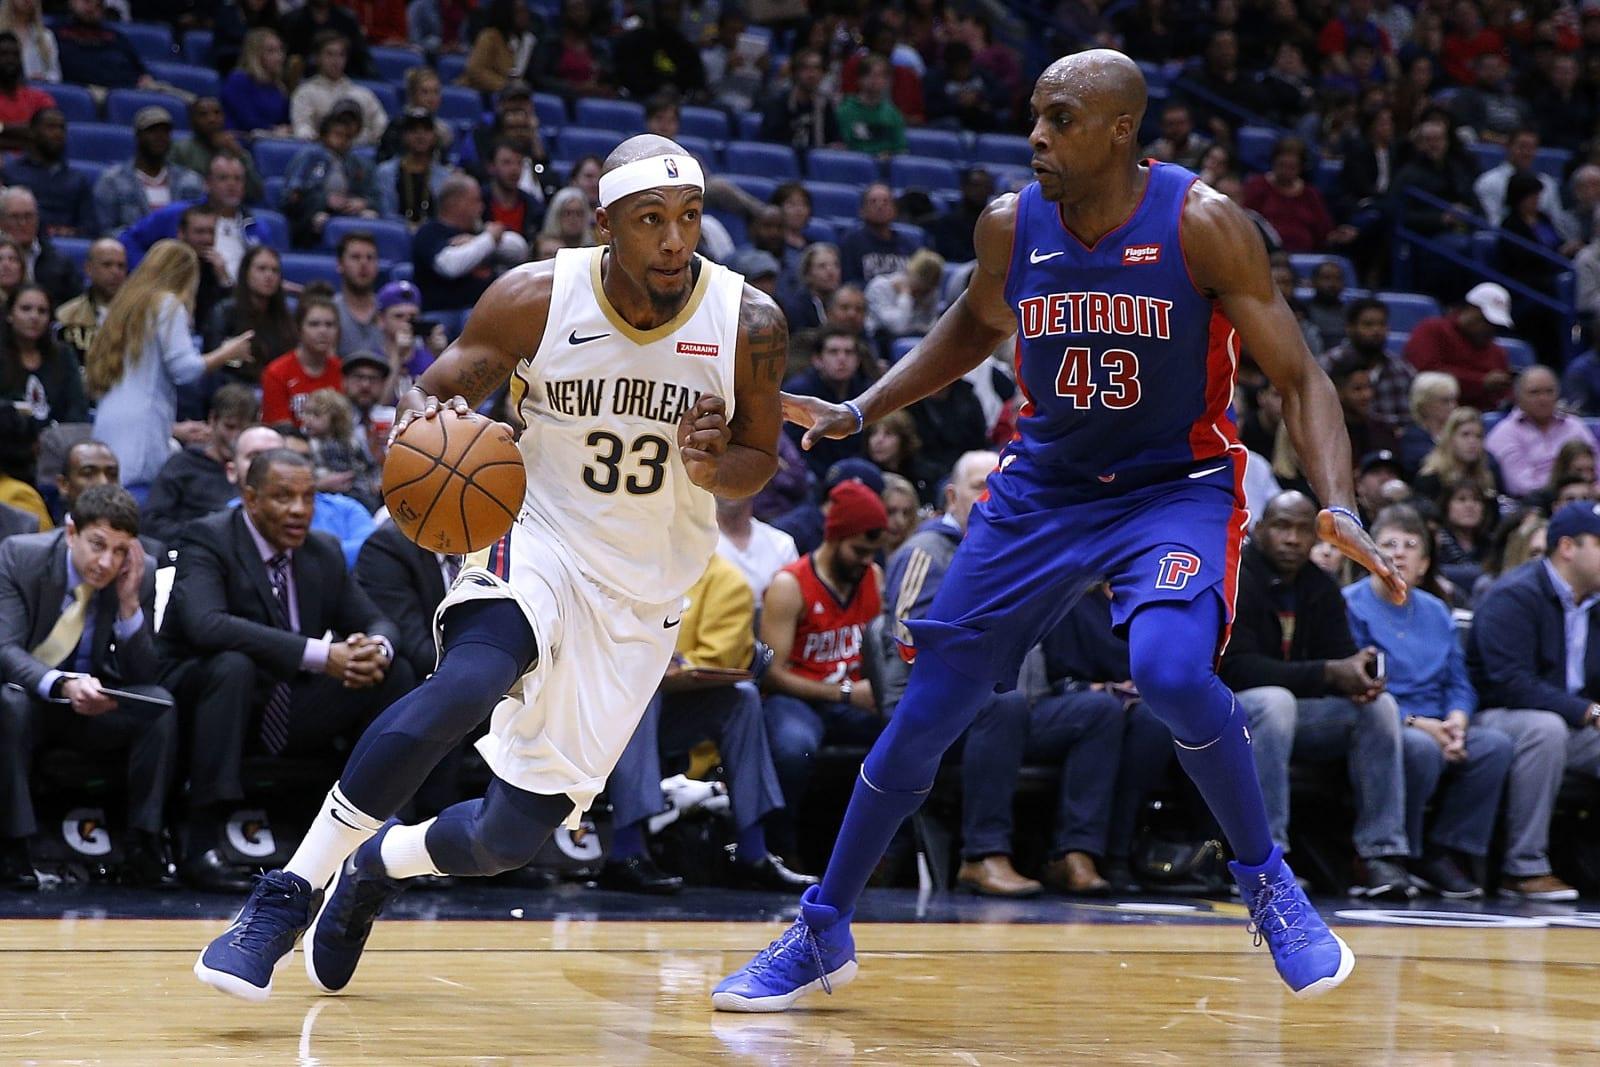 Dante Cunningham, New Orleans Pelicans